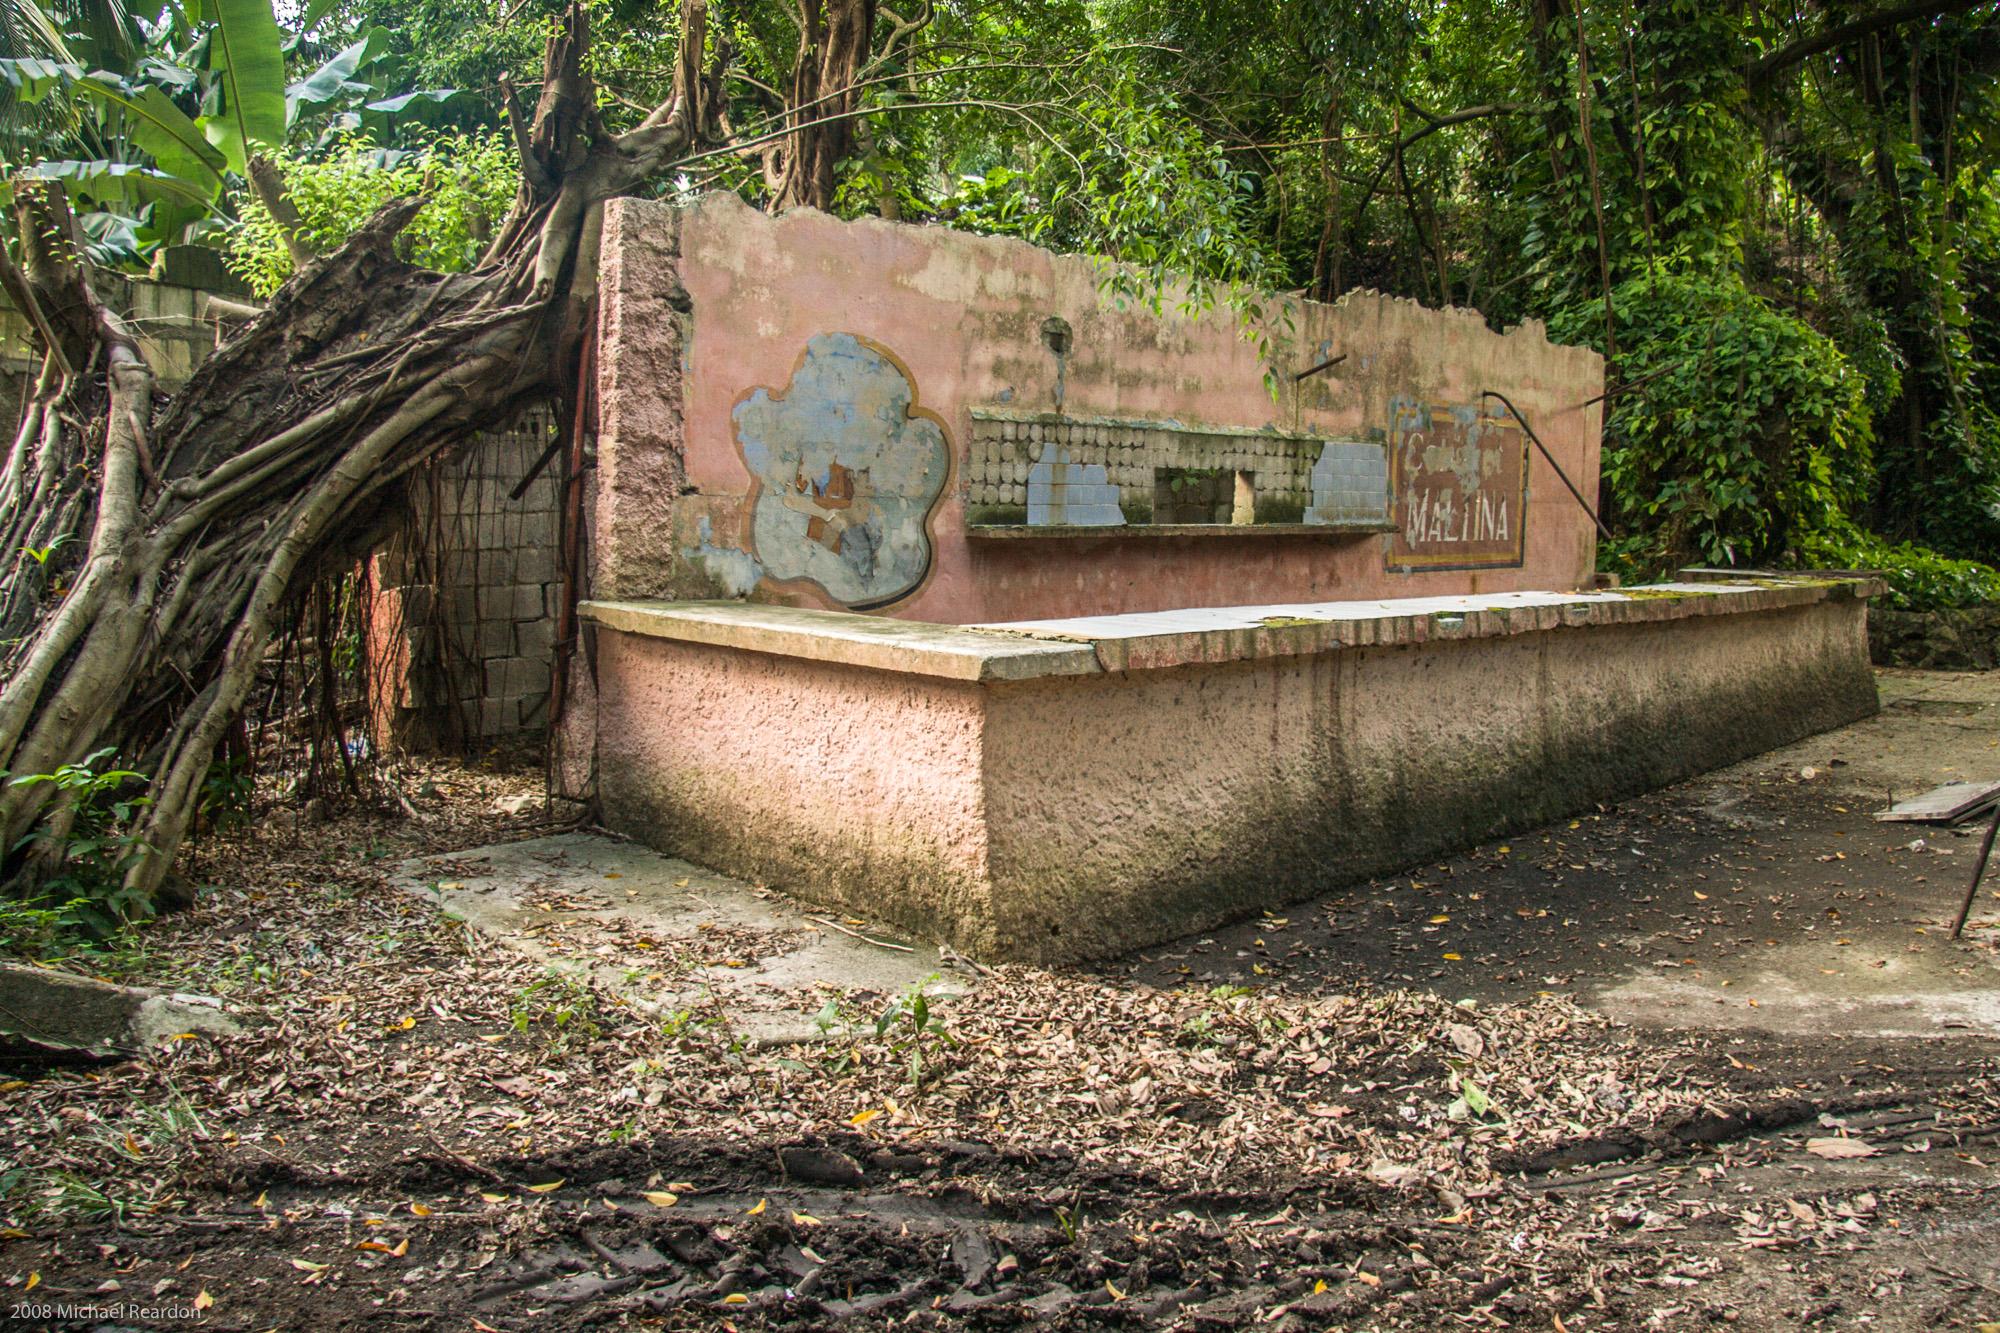 havana-jardin-tropical-6132